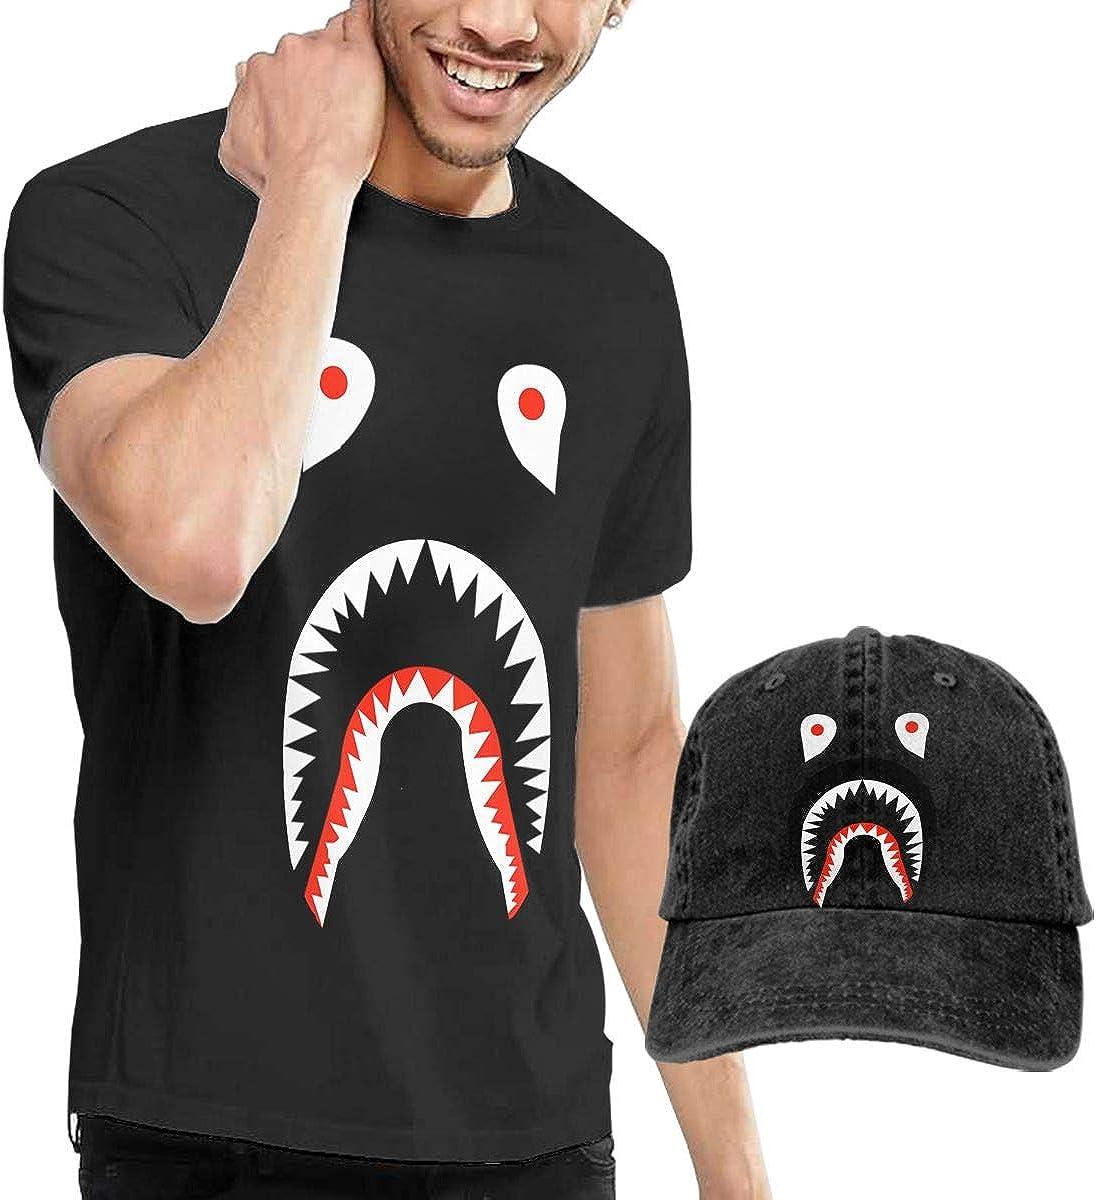 Bape Men's Classic Short Sleeve Crew Neck T-Shirt + HAT Combo